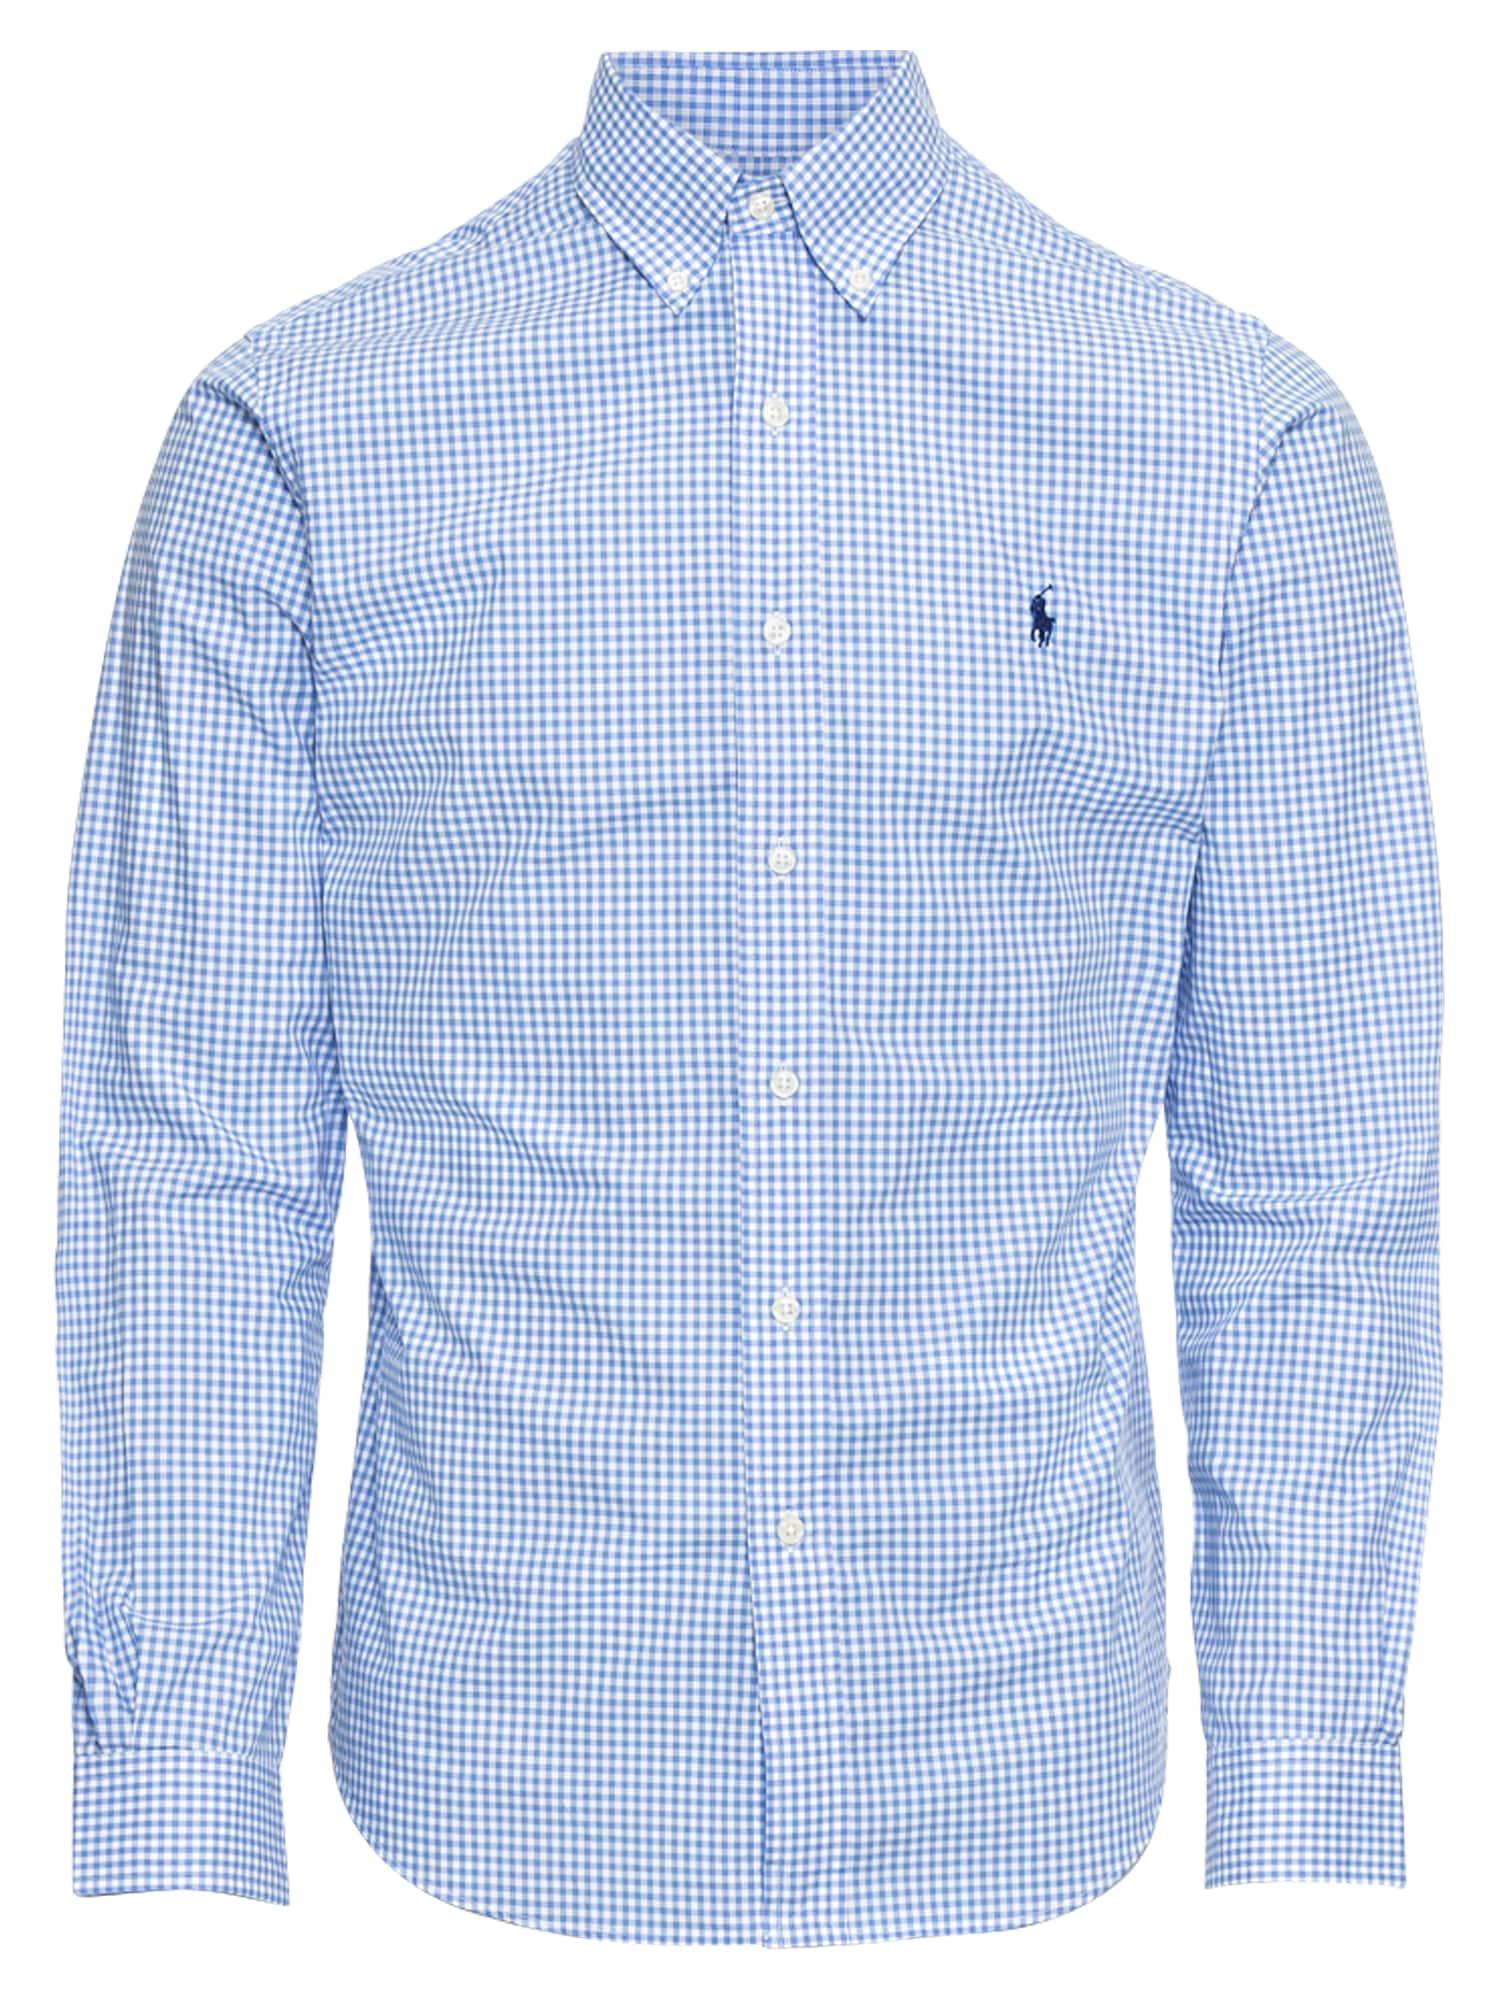 Košile SL BD PPC SP-LONG SLEEVE-SPORT SHIRT modrá bílá POLO RALPH LAUREN